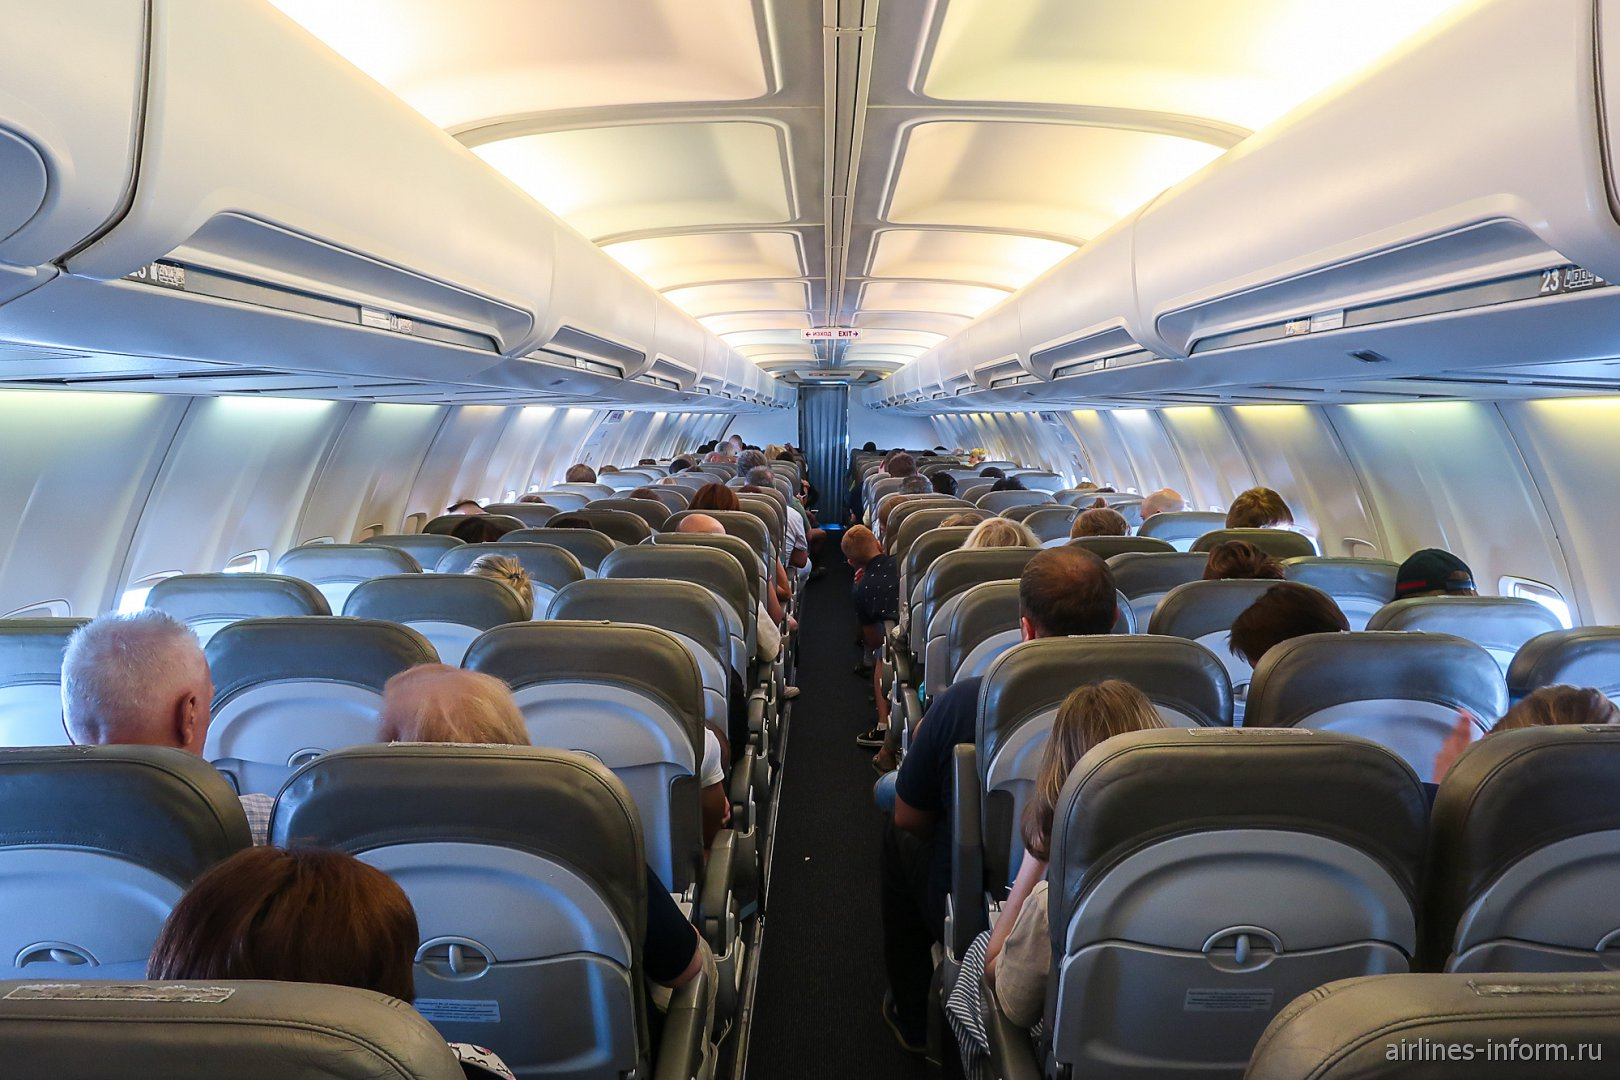 Пассажирский салон самолета Боинг-737-300 авиакомпании Bul Air